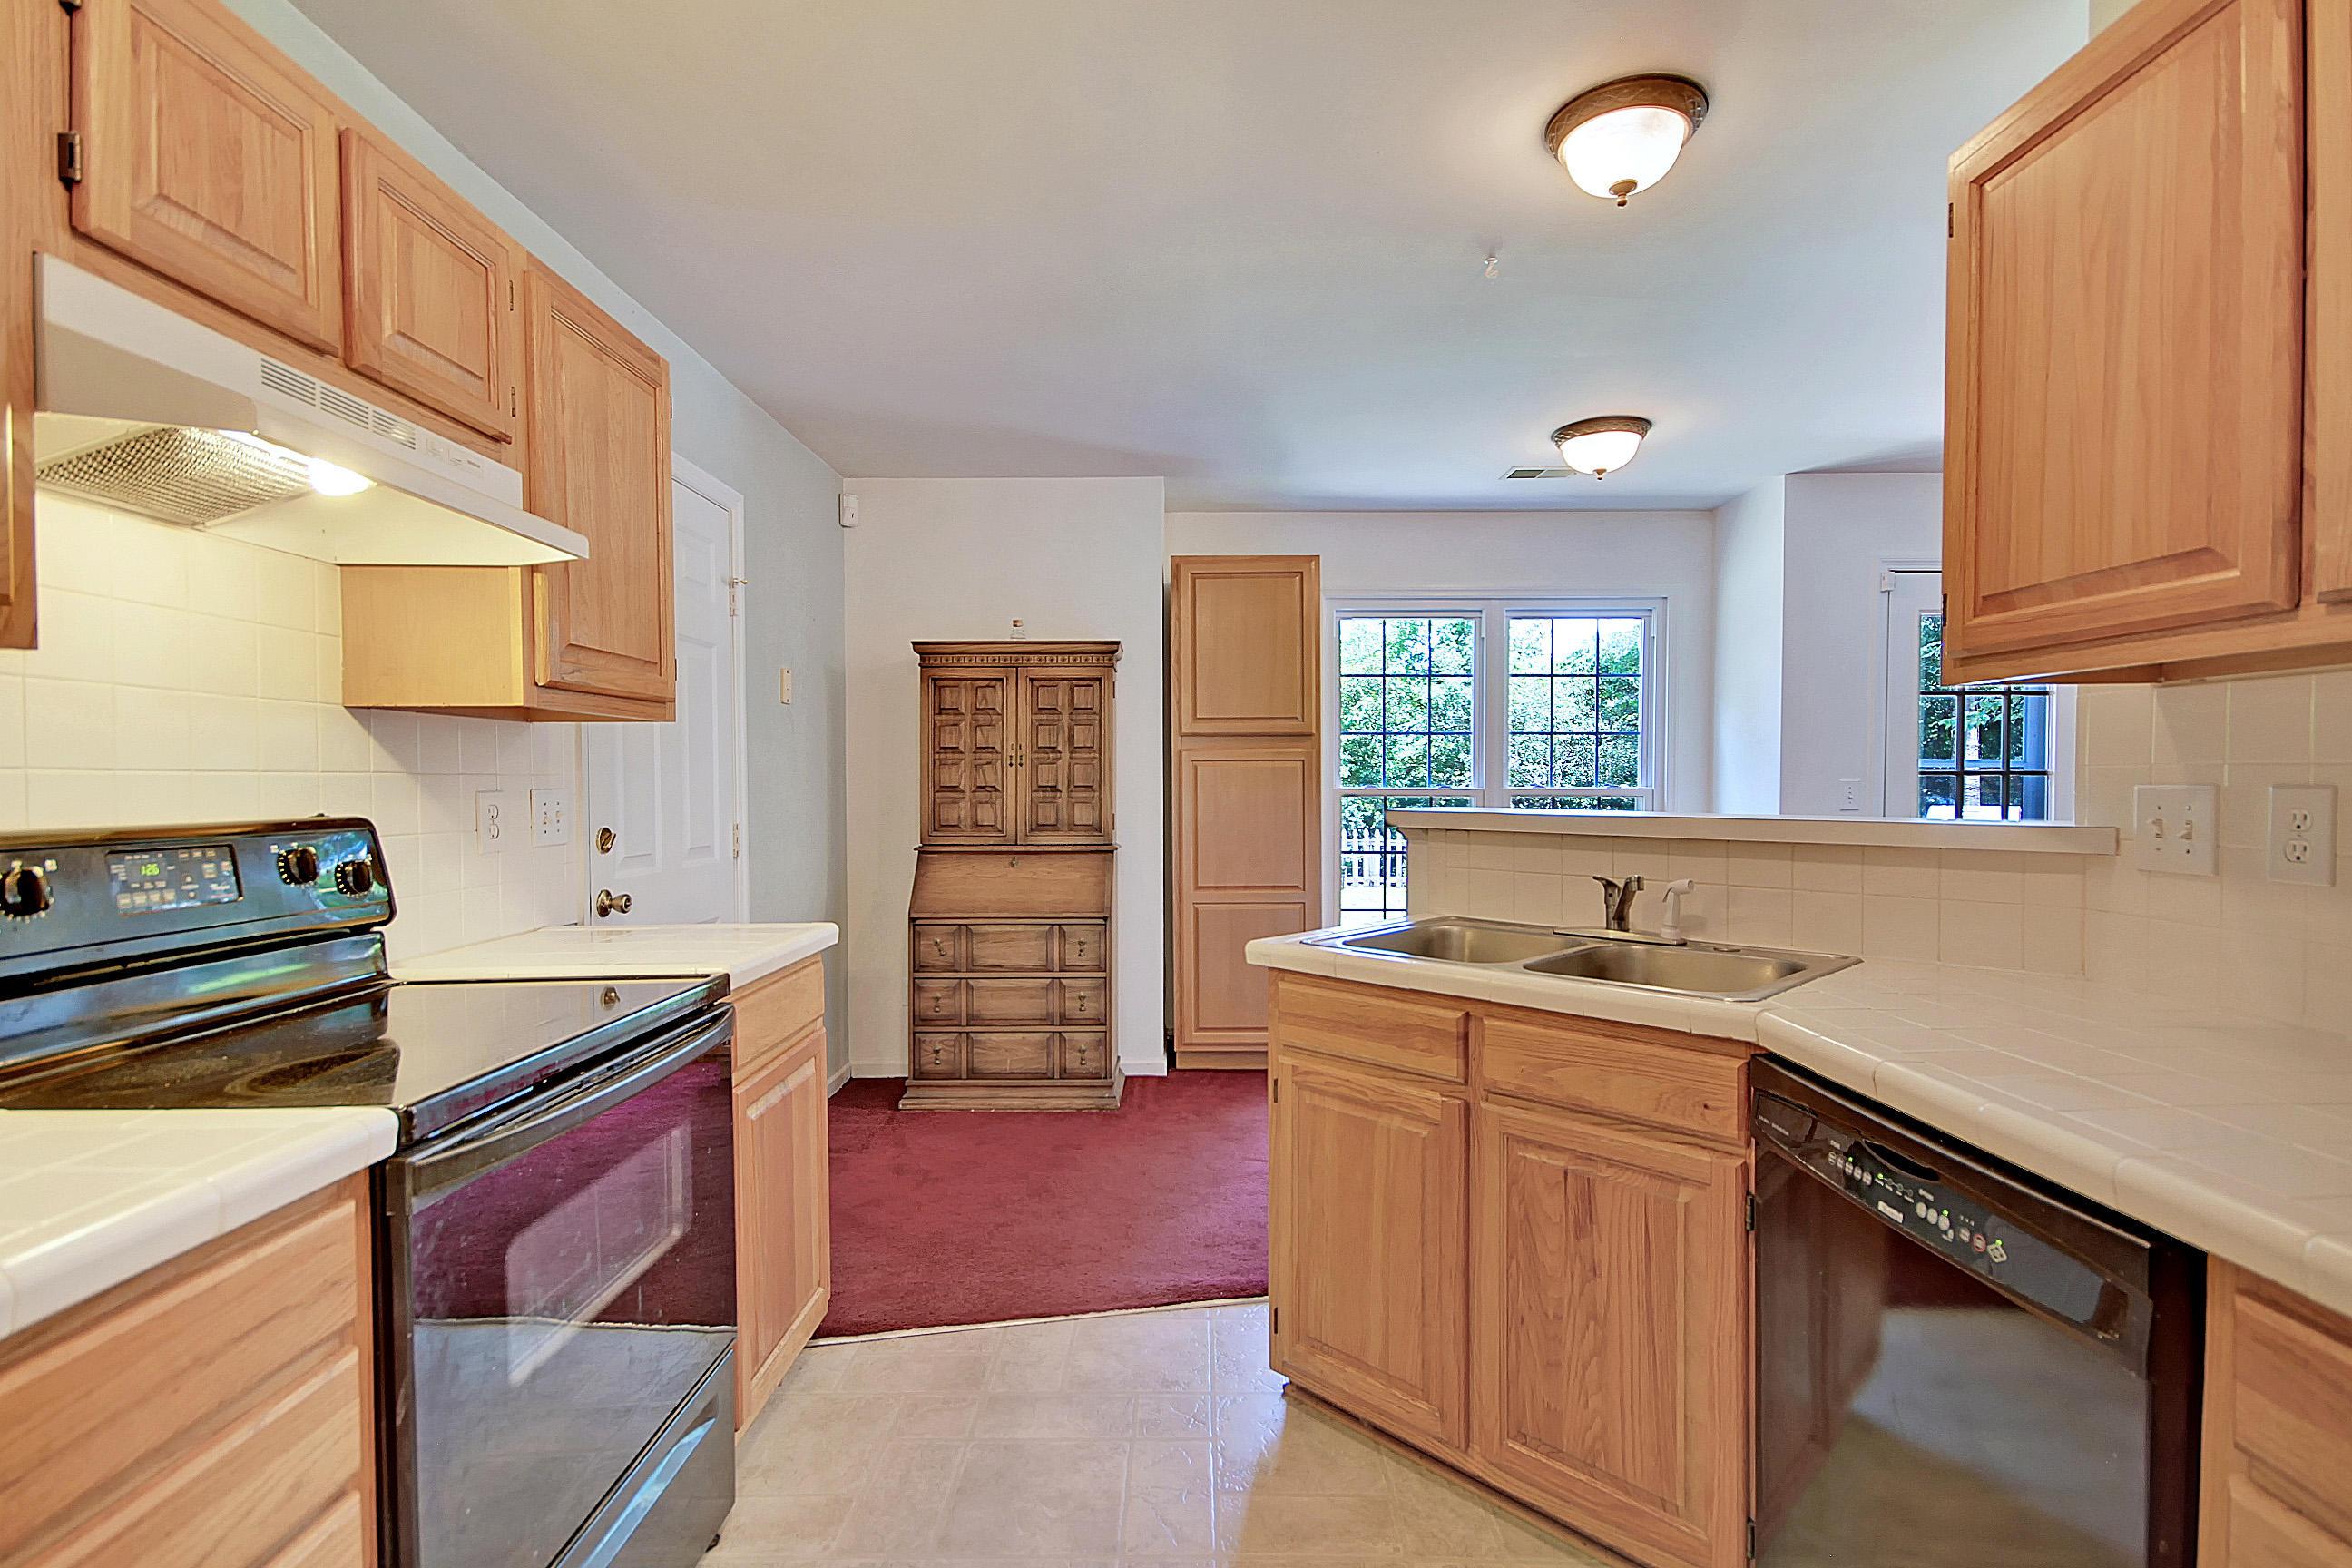 Center Lake Homes For Sale - 1252 Center Lake, Mount Pleasant, SC - 9